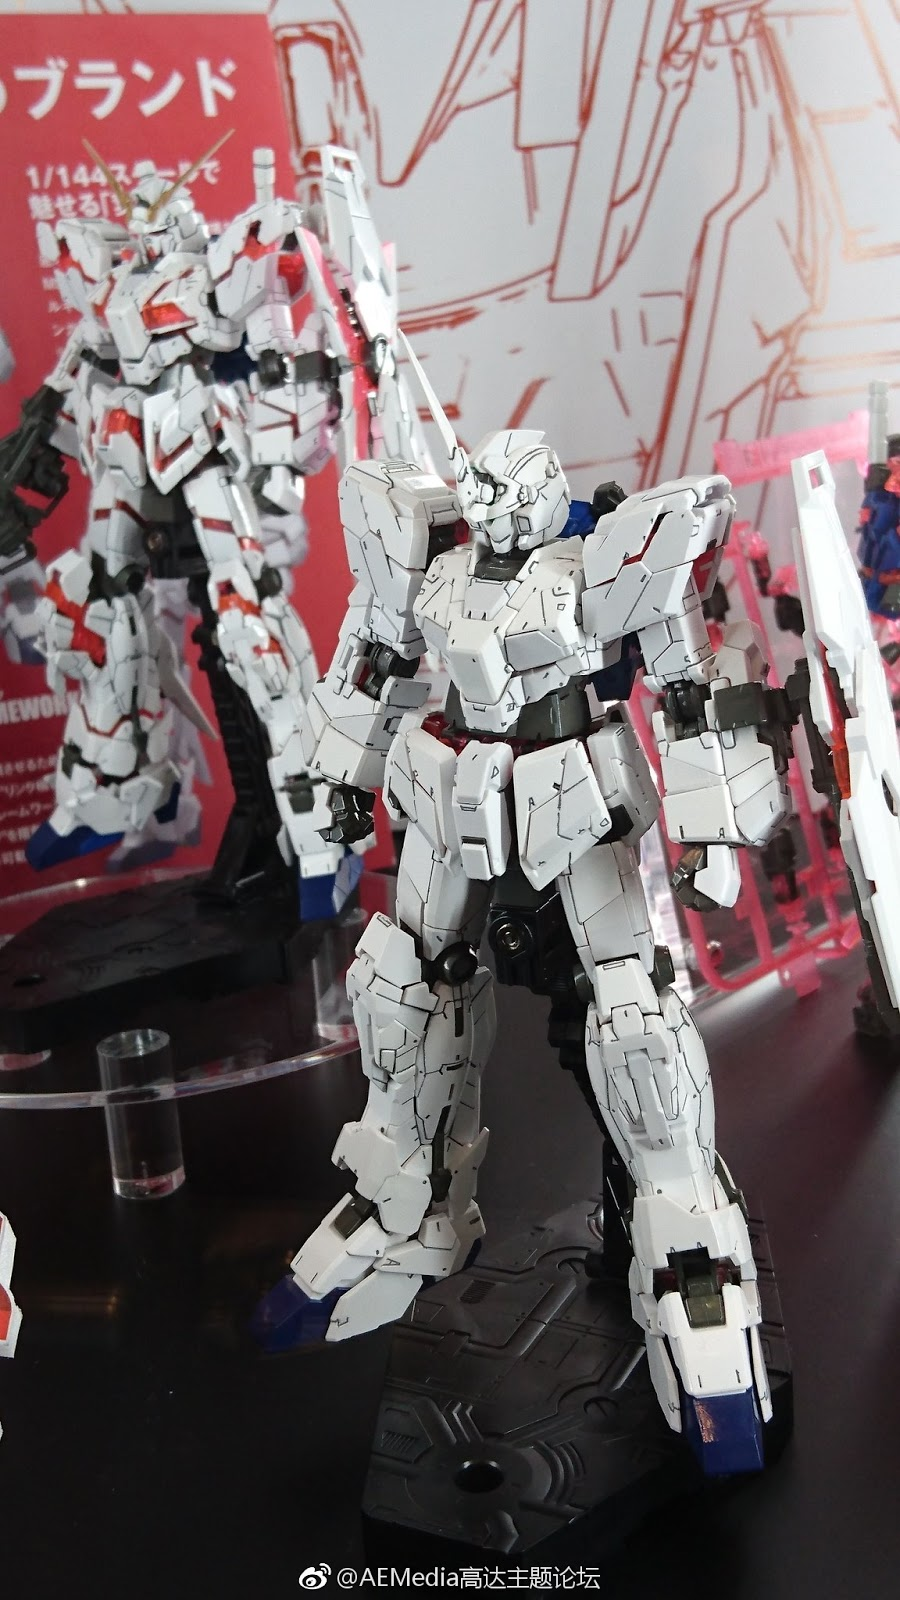 RG 1/144 Unicorn Gundam Exhibited at 56th Shizuoka Hobby Show